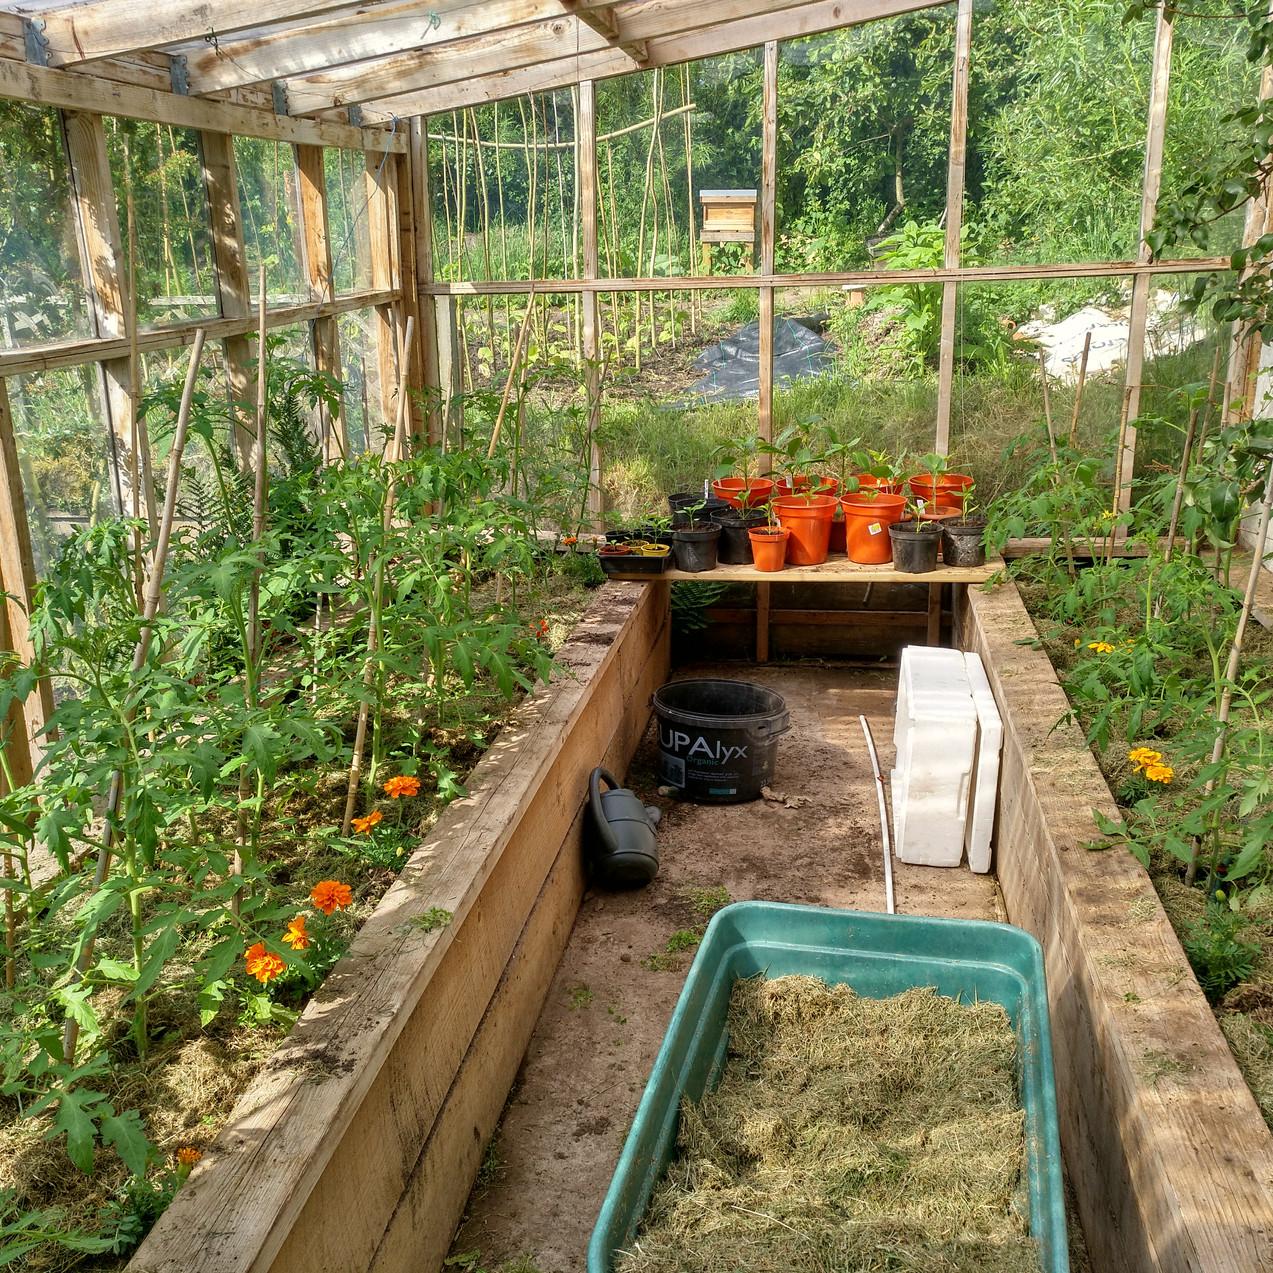 Tomato plants galore